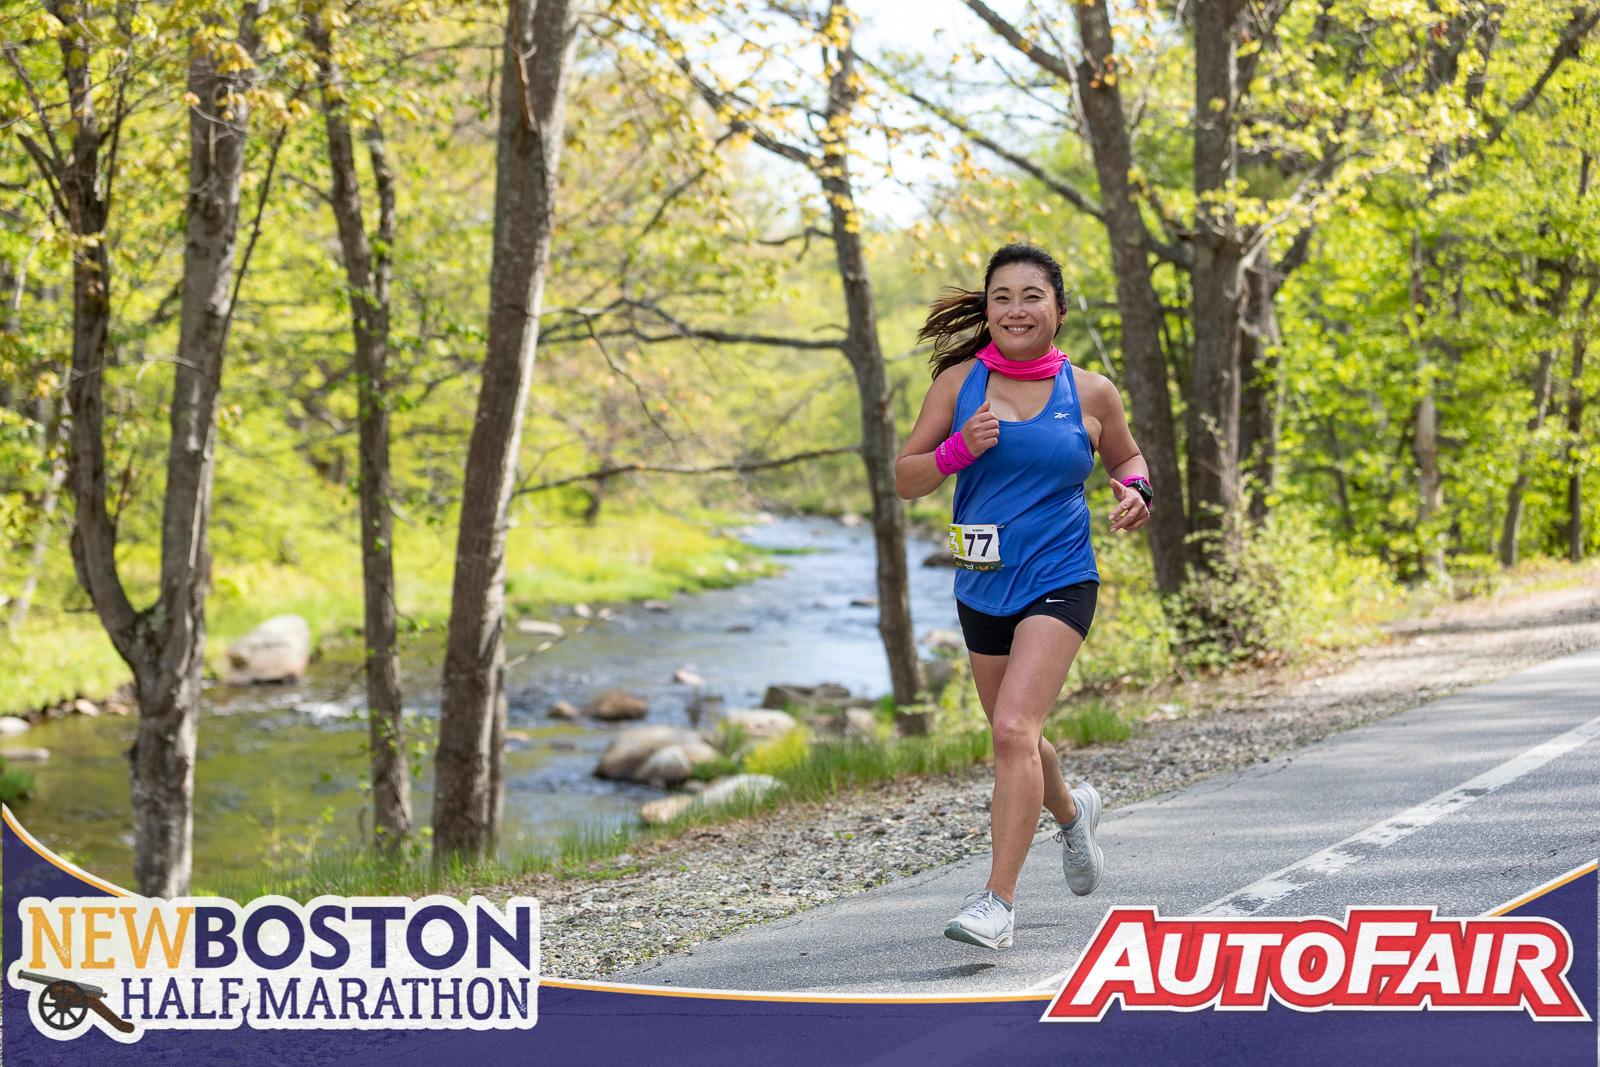 PHOTOS: New Boston Half Marathon – 2021